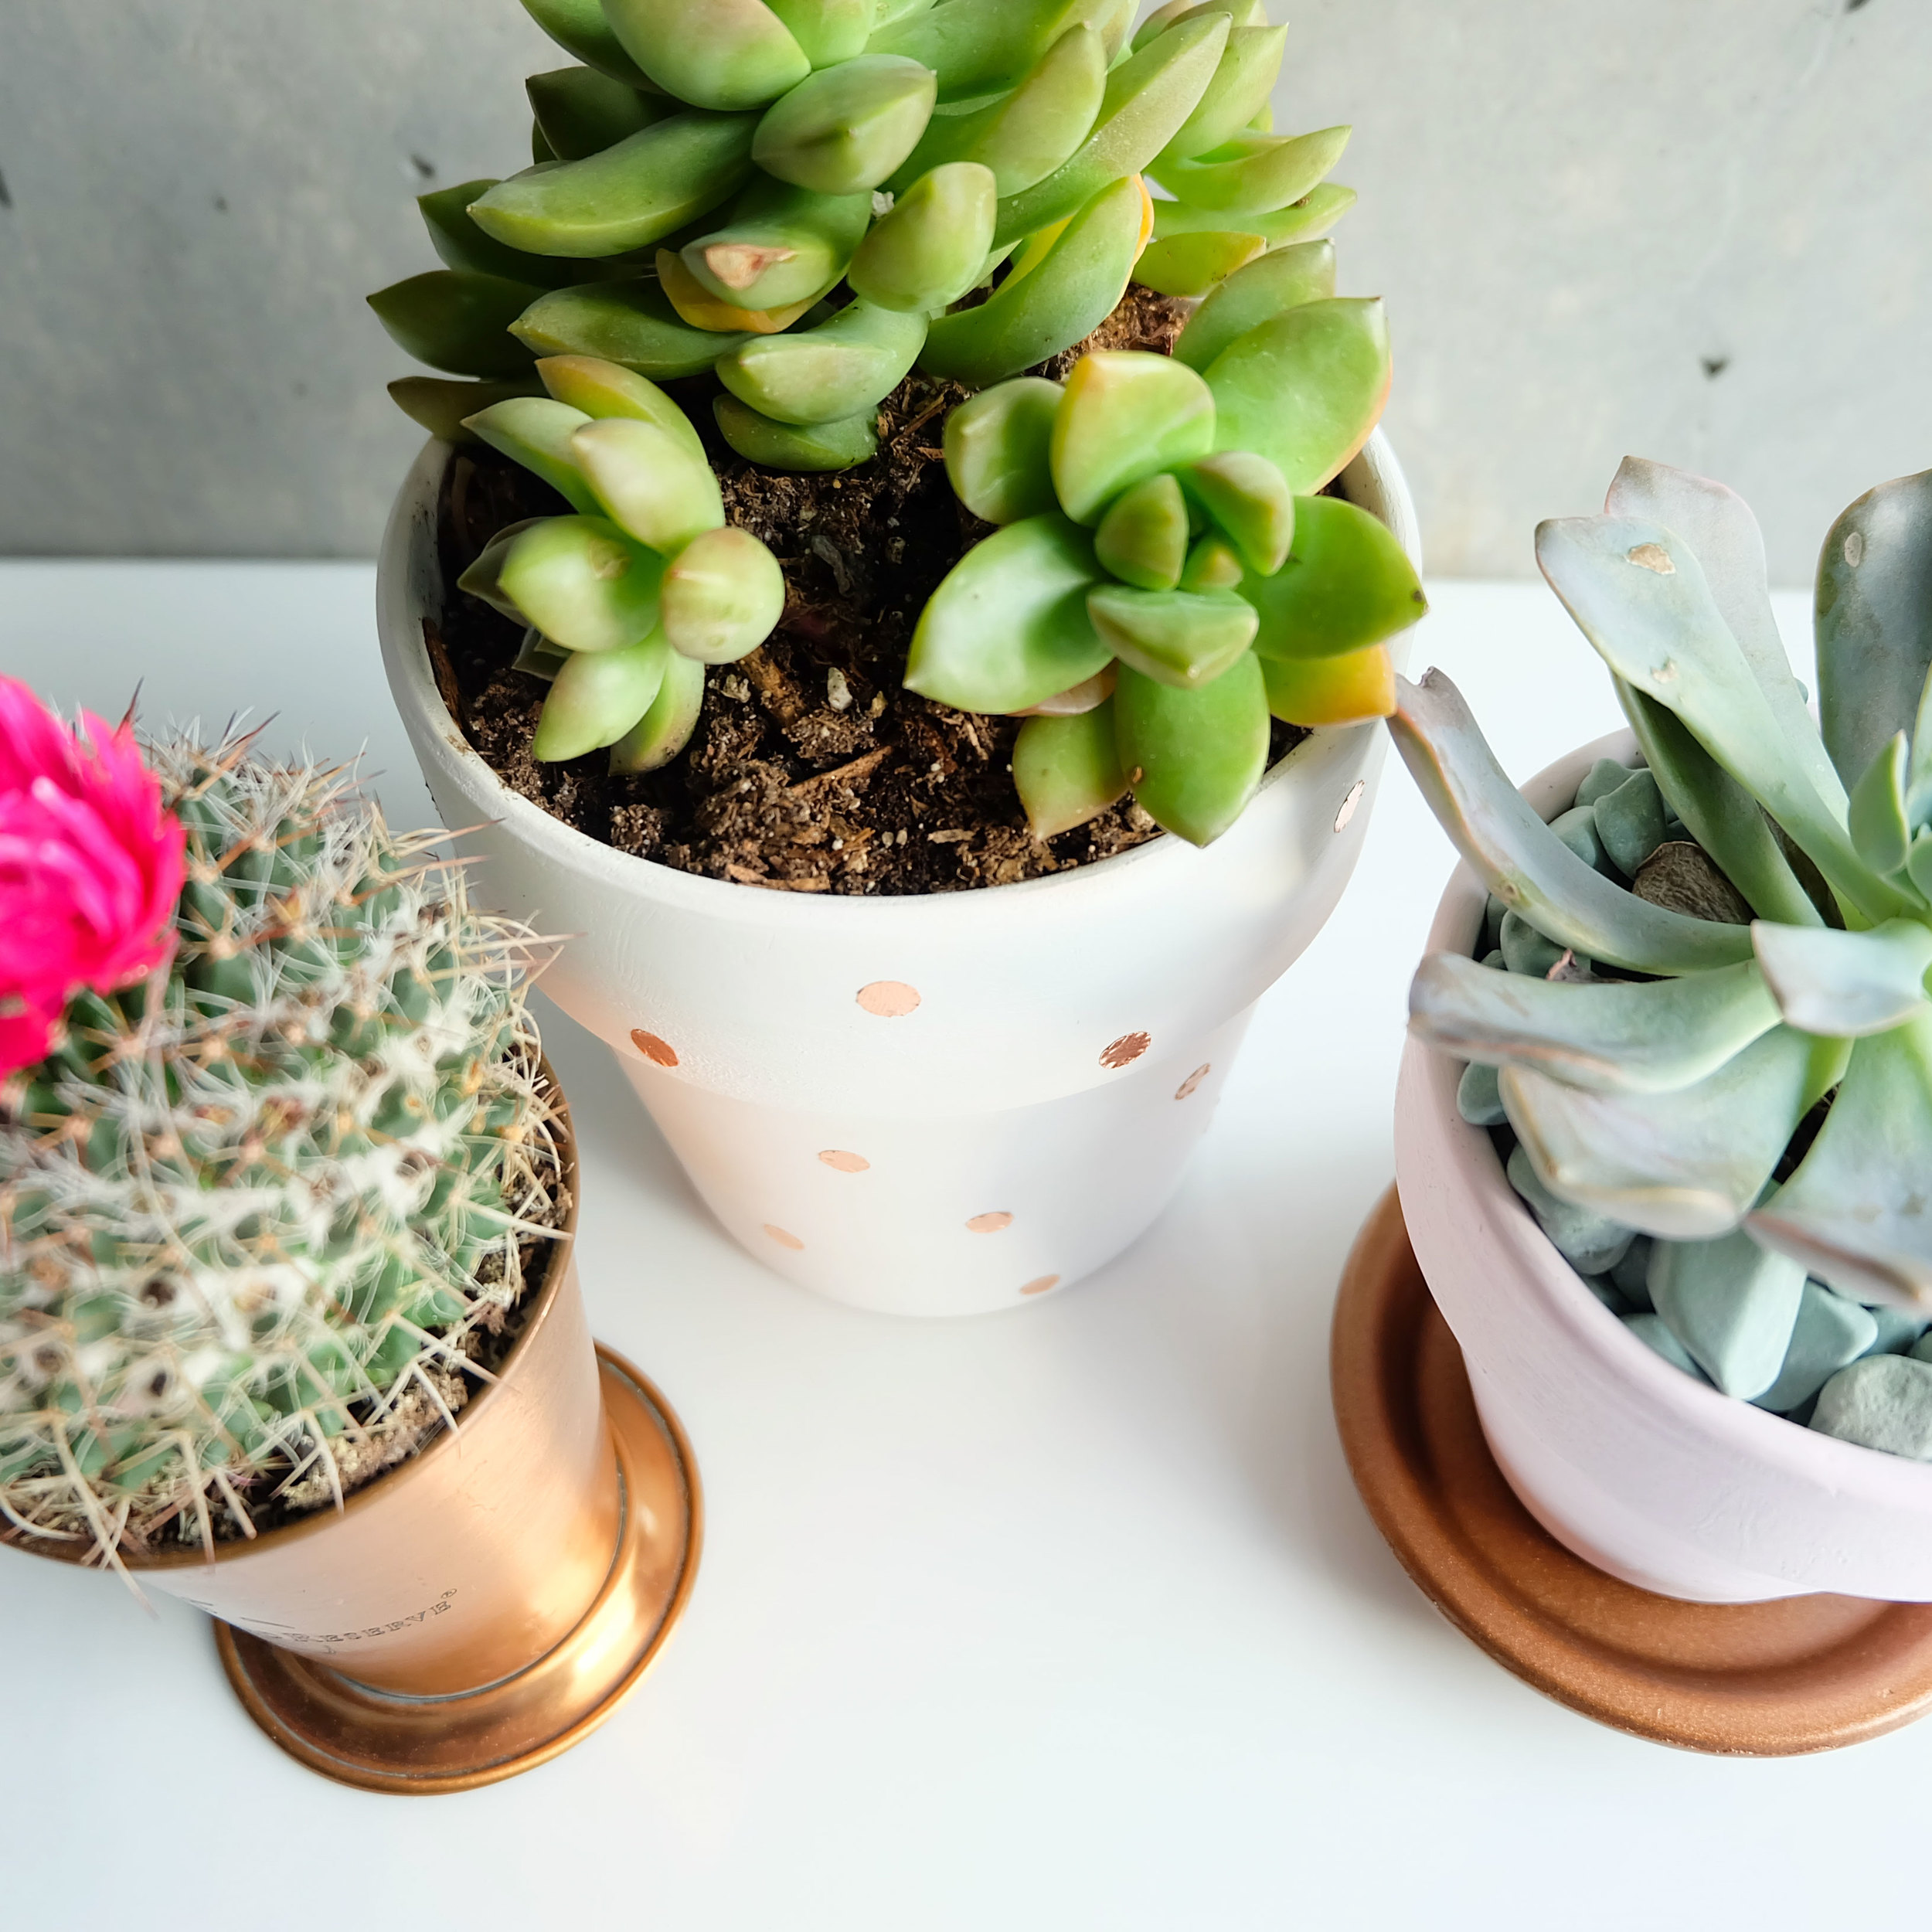 DIY succulent planters, copper foil tape polka dots, Indoor plants, Easy & inexpensive DIY